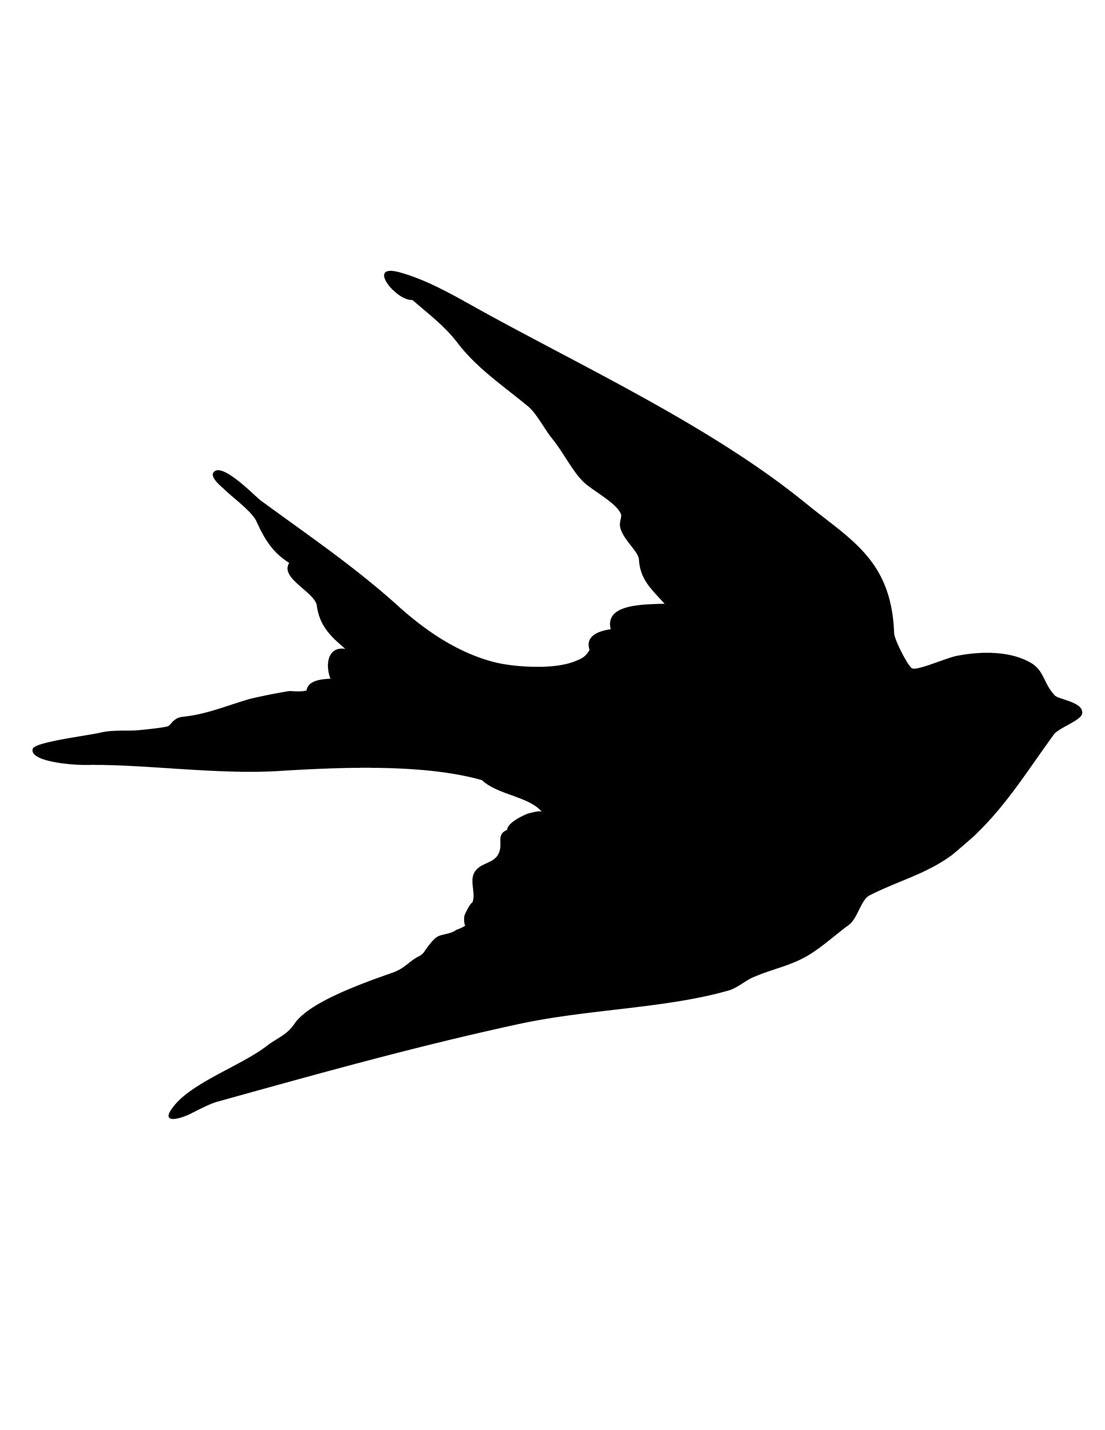 1105x1430 Clip Art Flying Bird Silhouette Transfer Printables Silhouettes